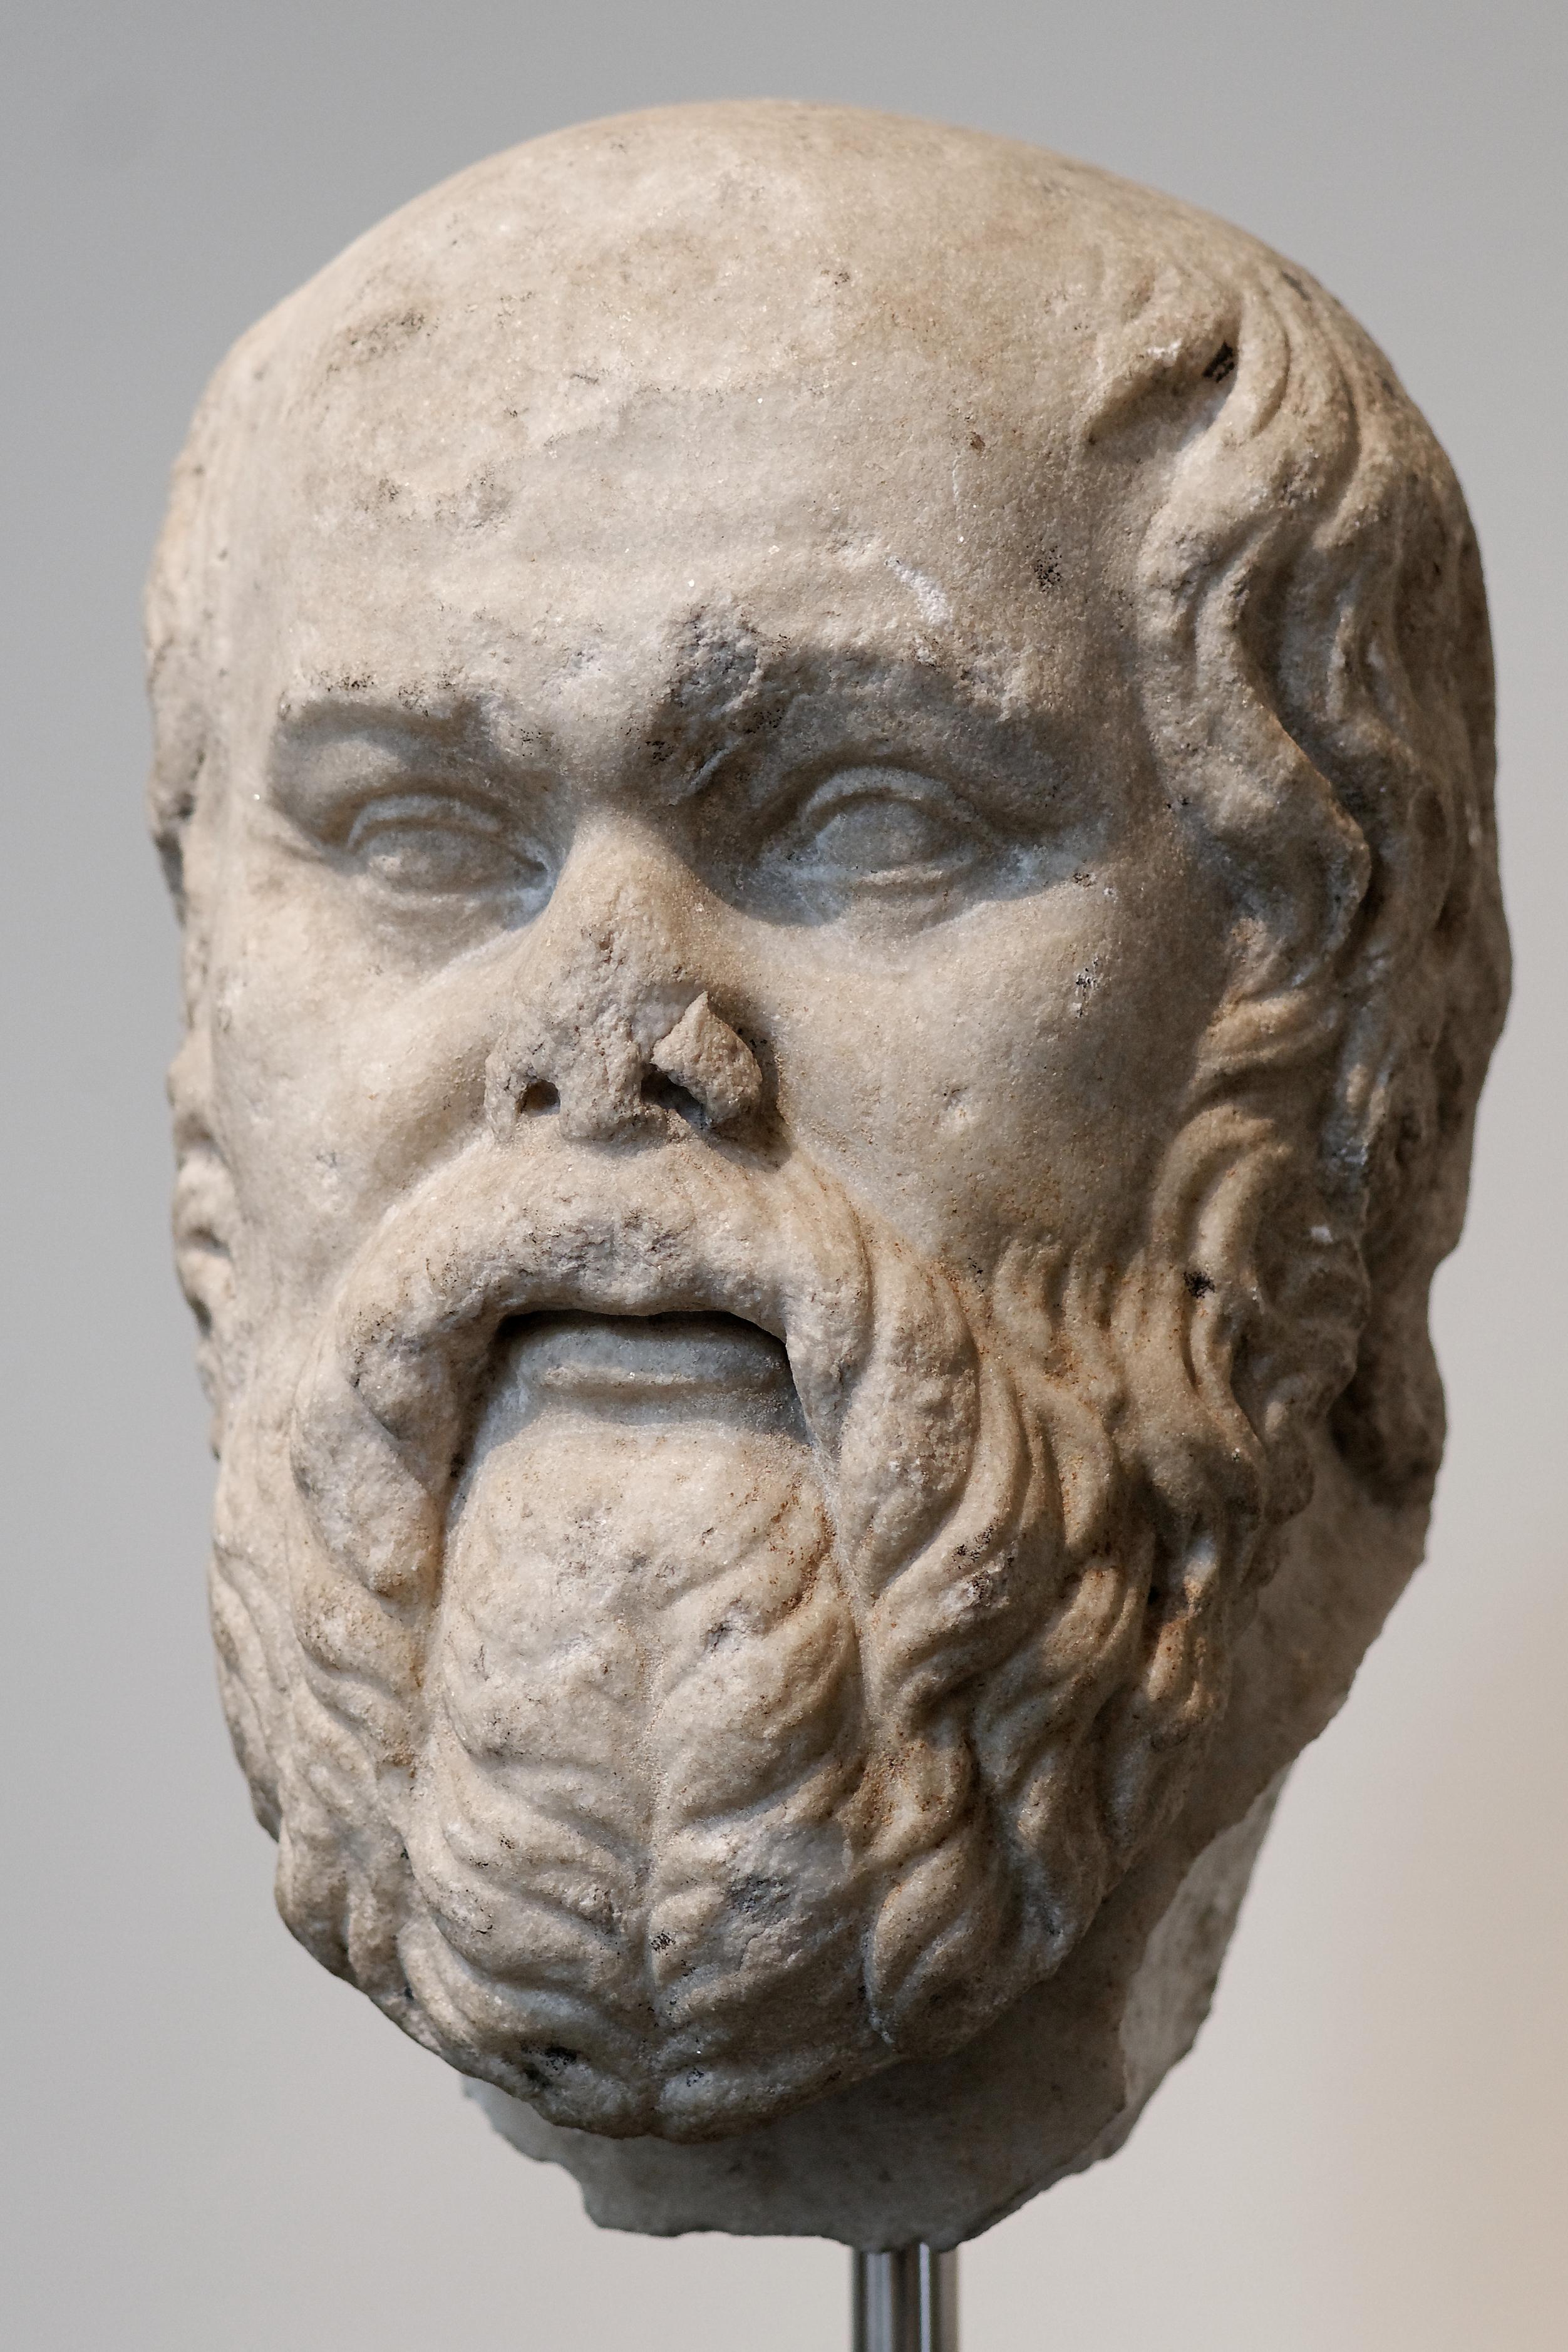 File:Socrates Met L.1991.94.2.jpg - Wikimedia Commons